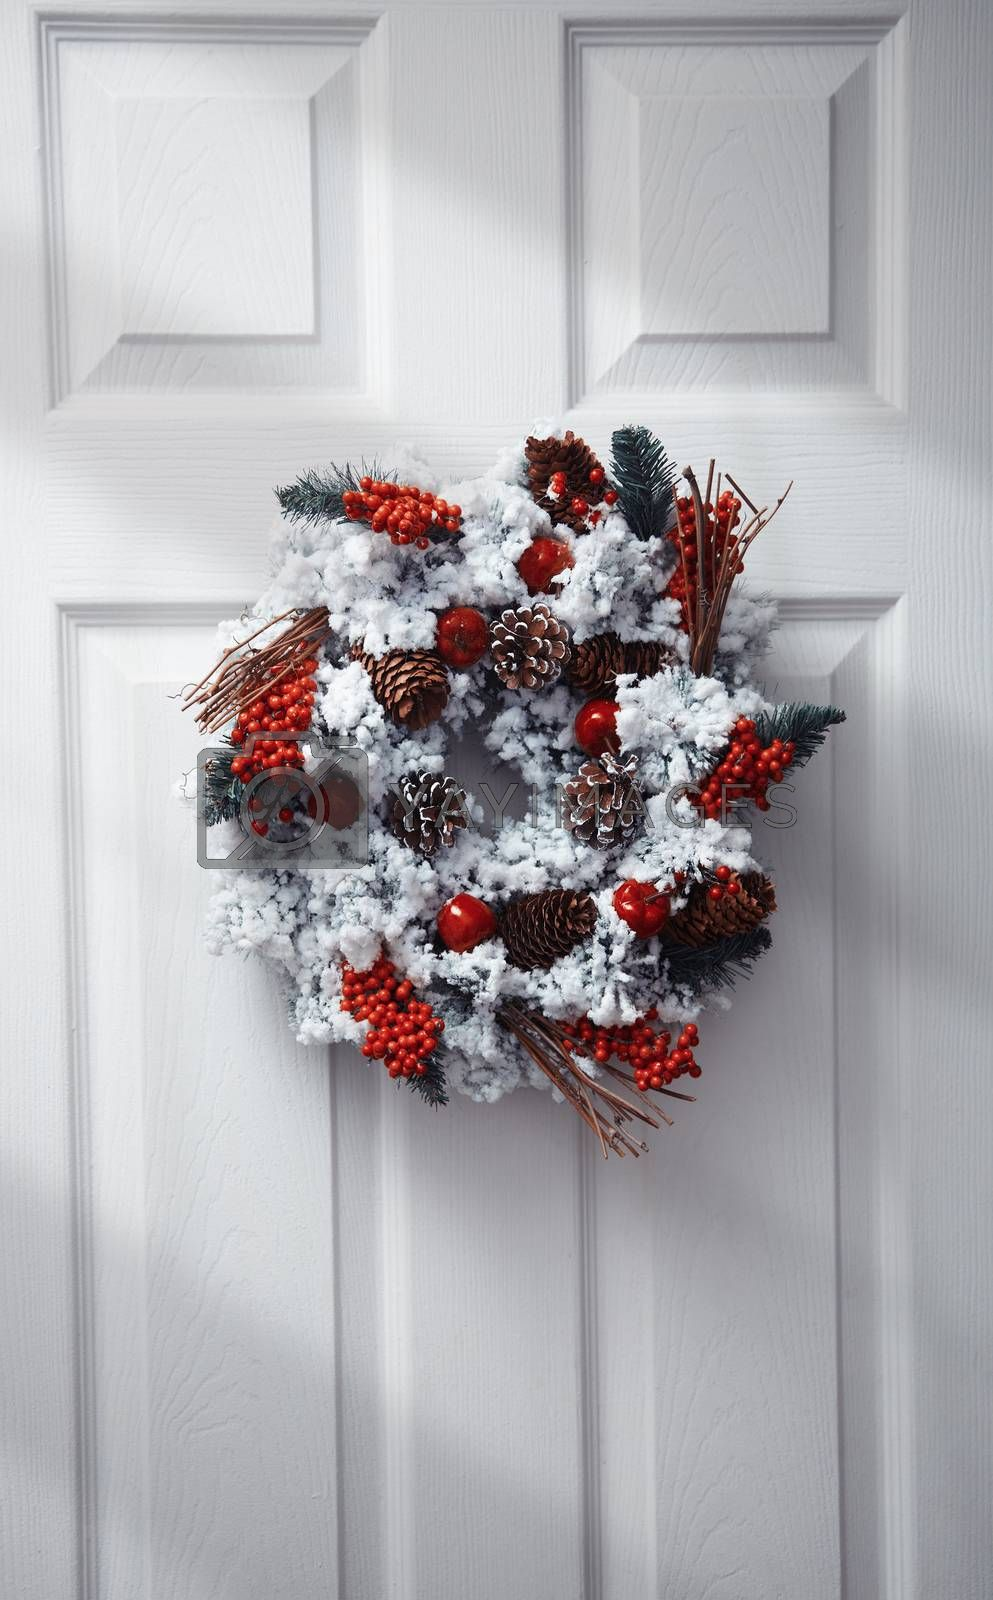 Christmas wreath by Novic